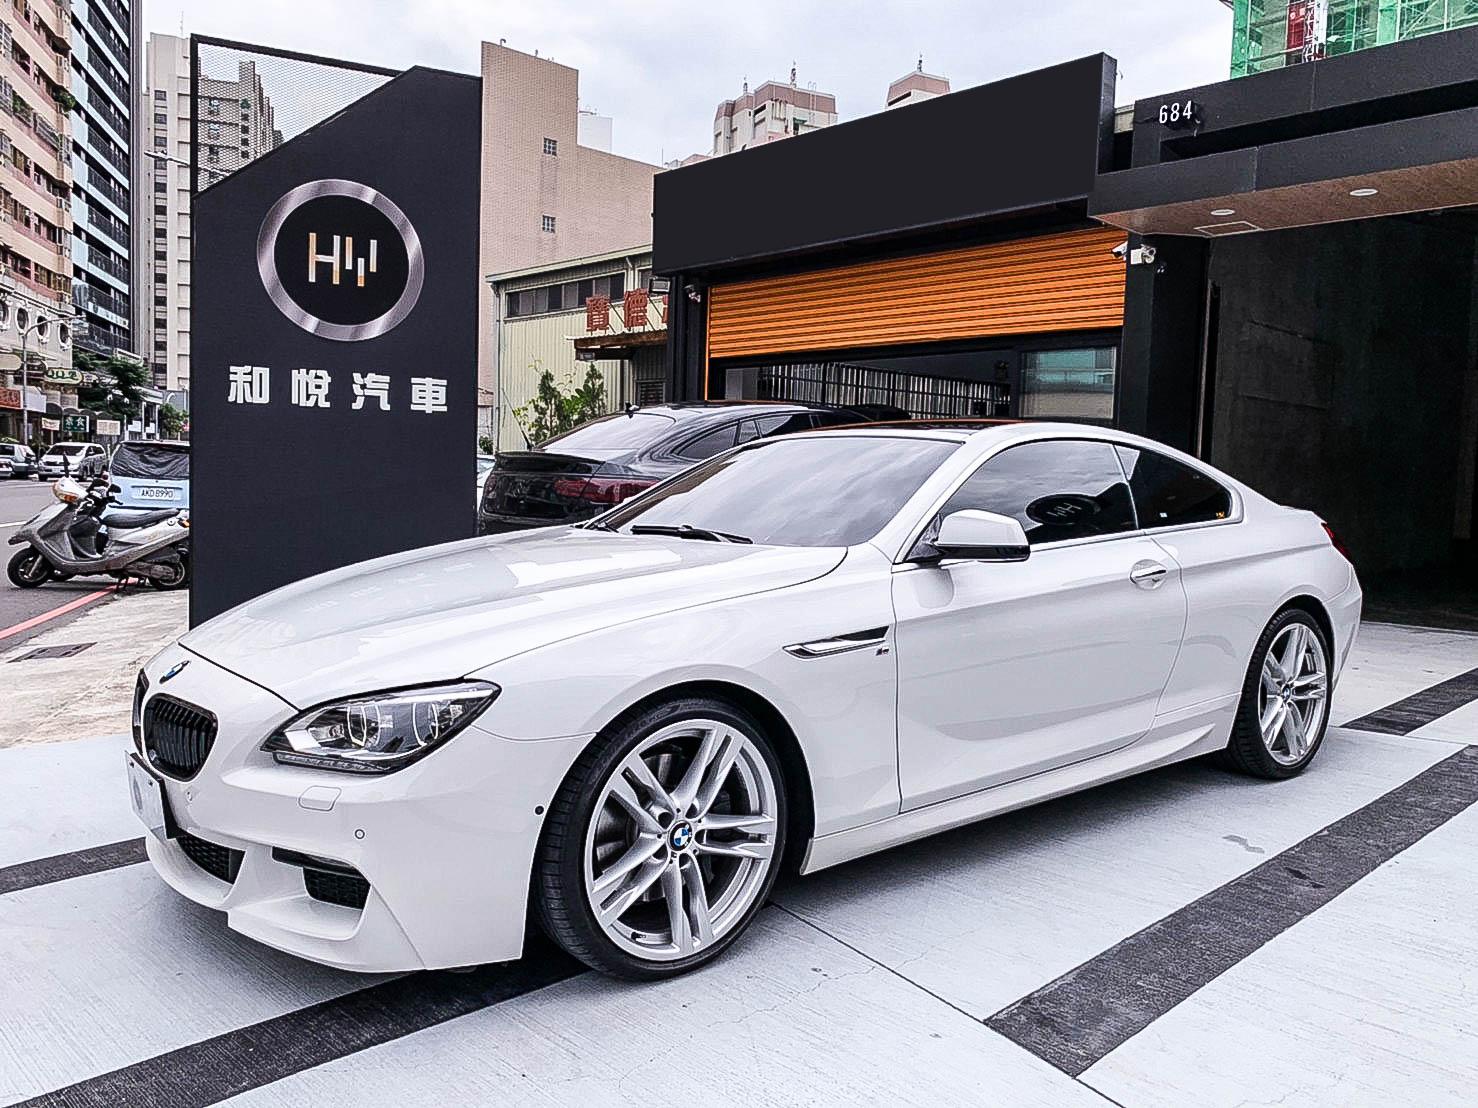 2012 BMW 寶馬 6-series coupe